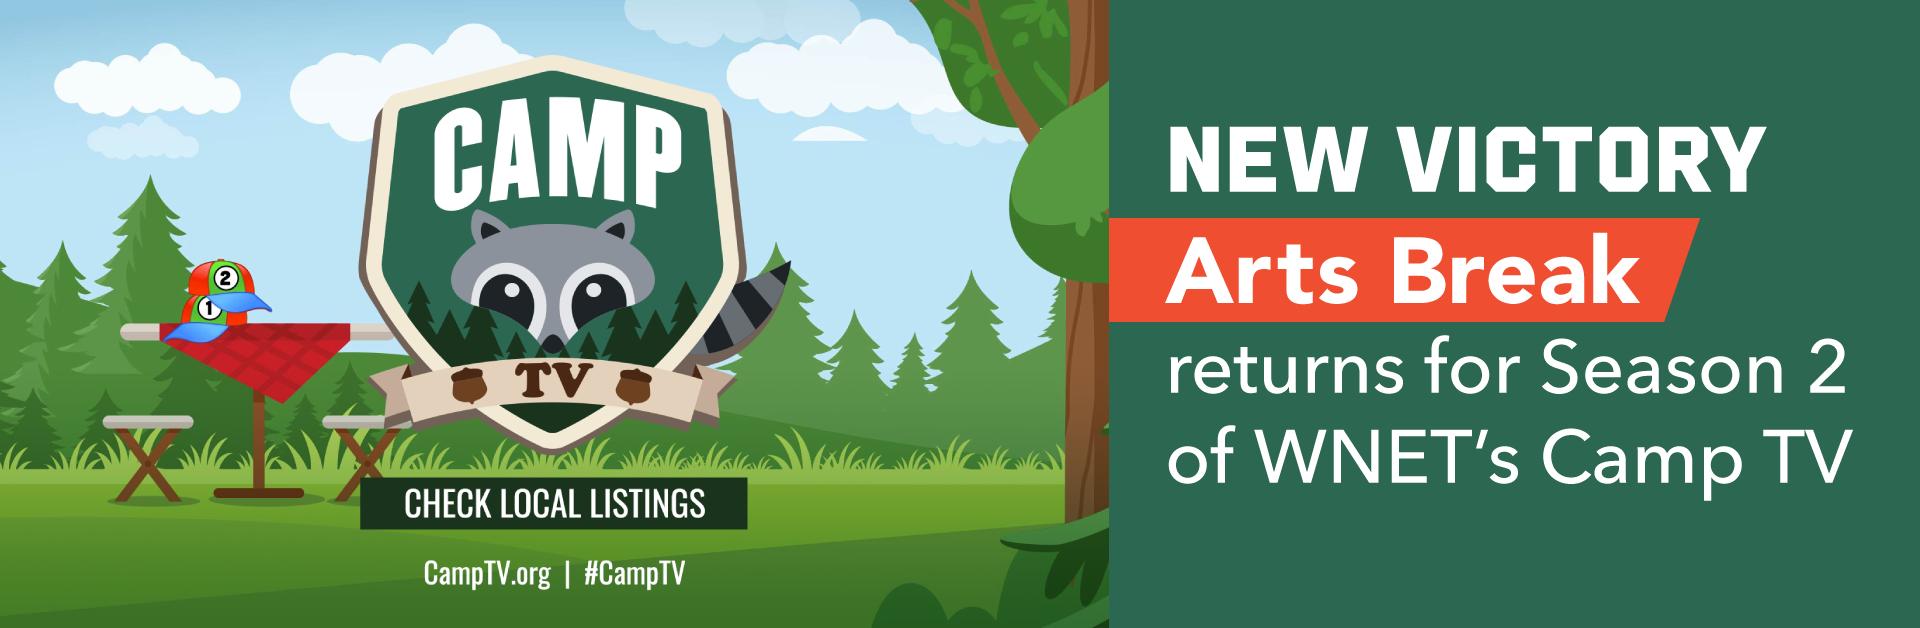 New Victory Arts Break Returns for Season 2 of WNET's Camp TV